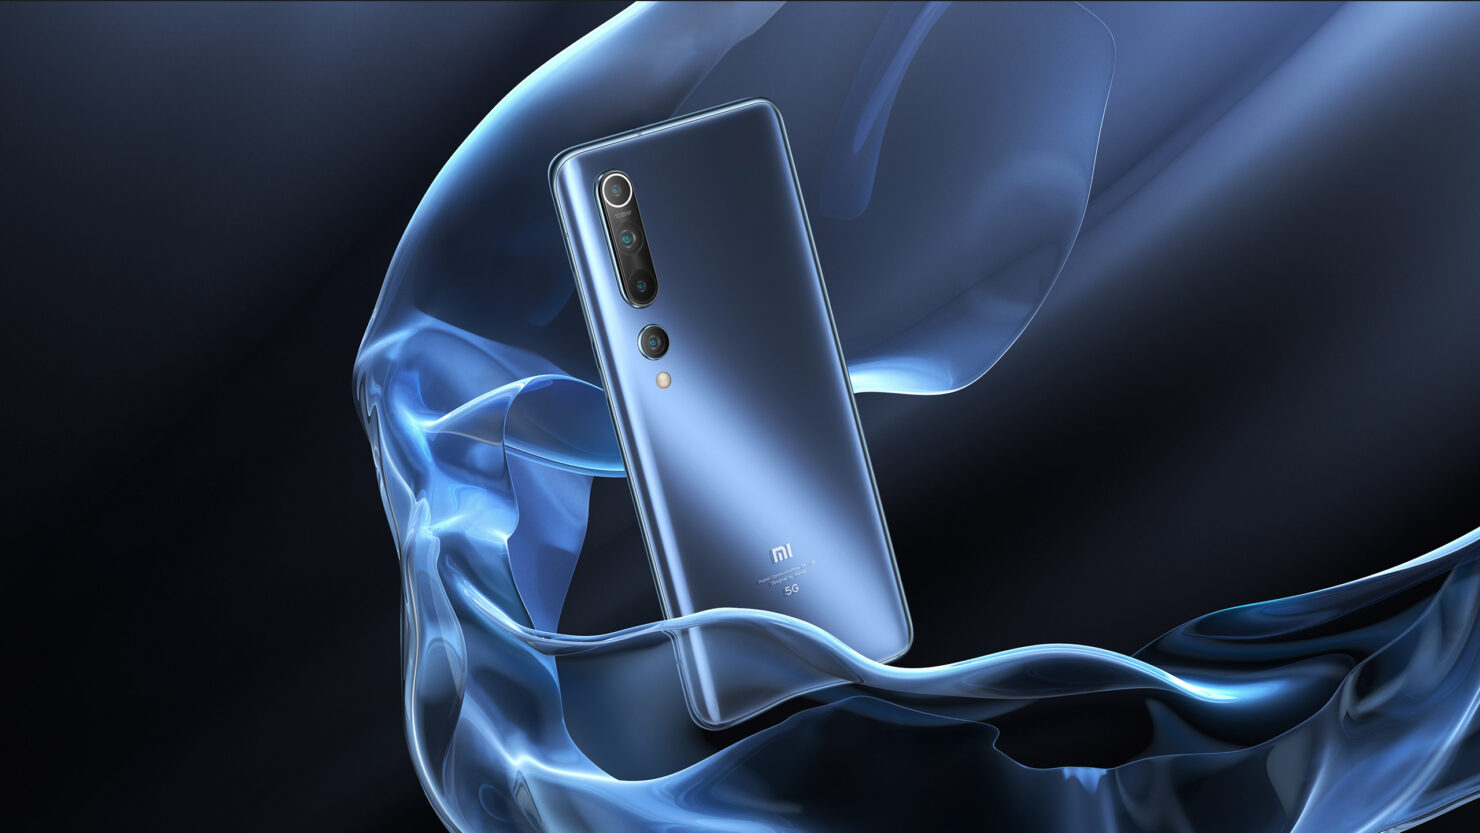 Xiaomi Mi 10, Mi 10 Pro Now Official: Features, Specs, Price, Release Date